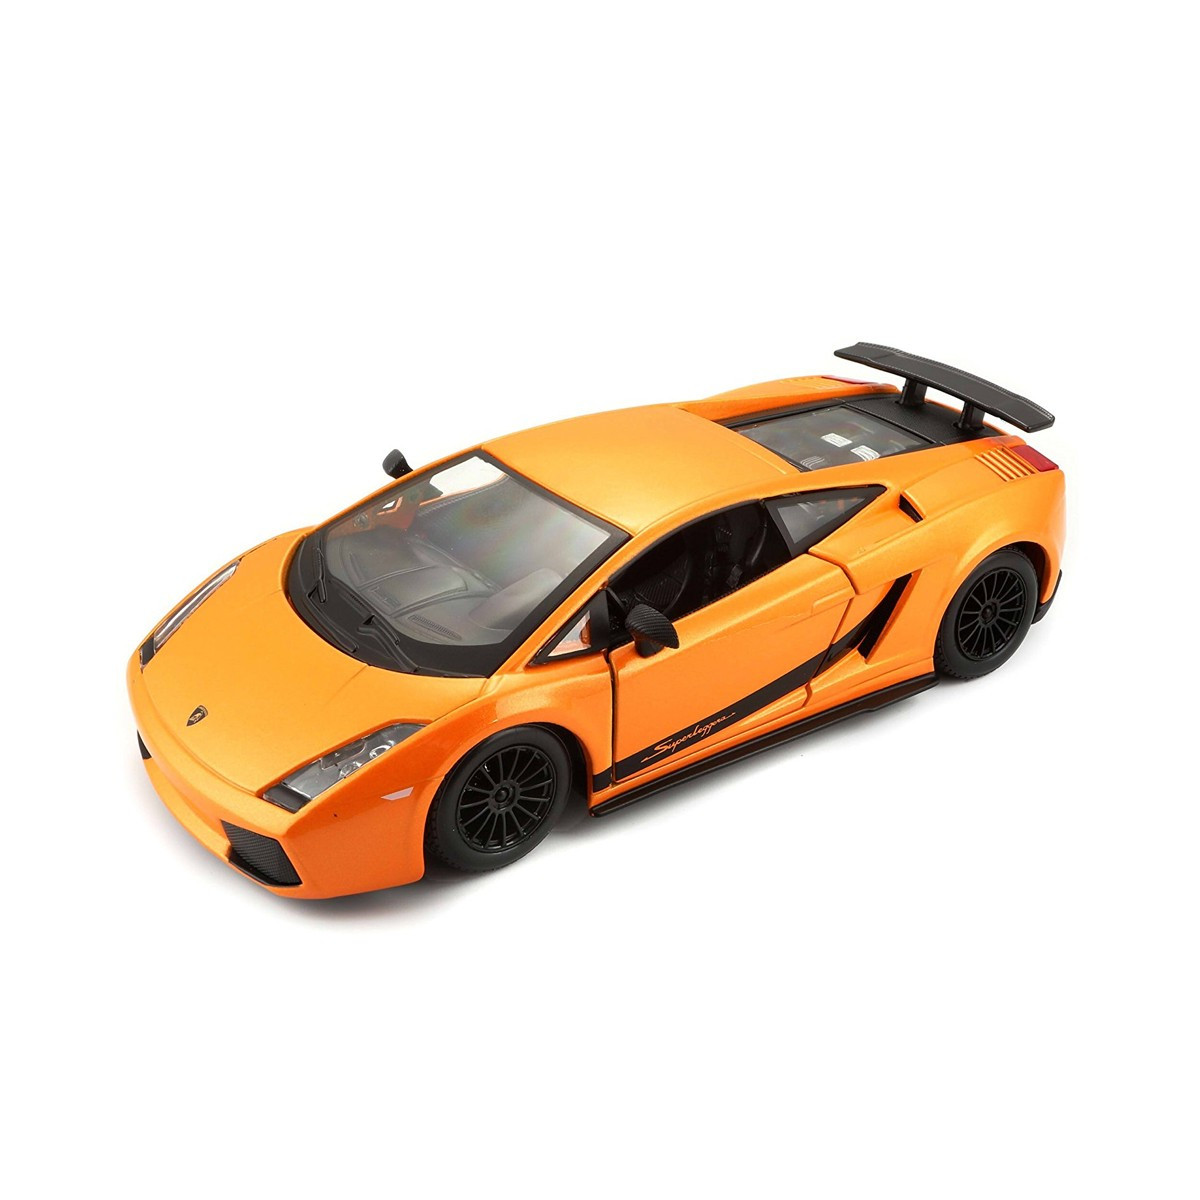 Модель авто Lamborghini Gallardo Superleggera 2007 зеленый, оранжевый металлик 1:24 BBurago 18-22108